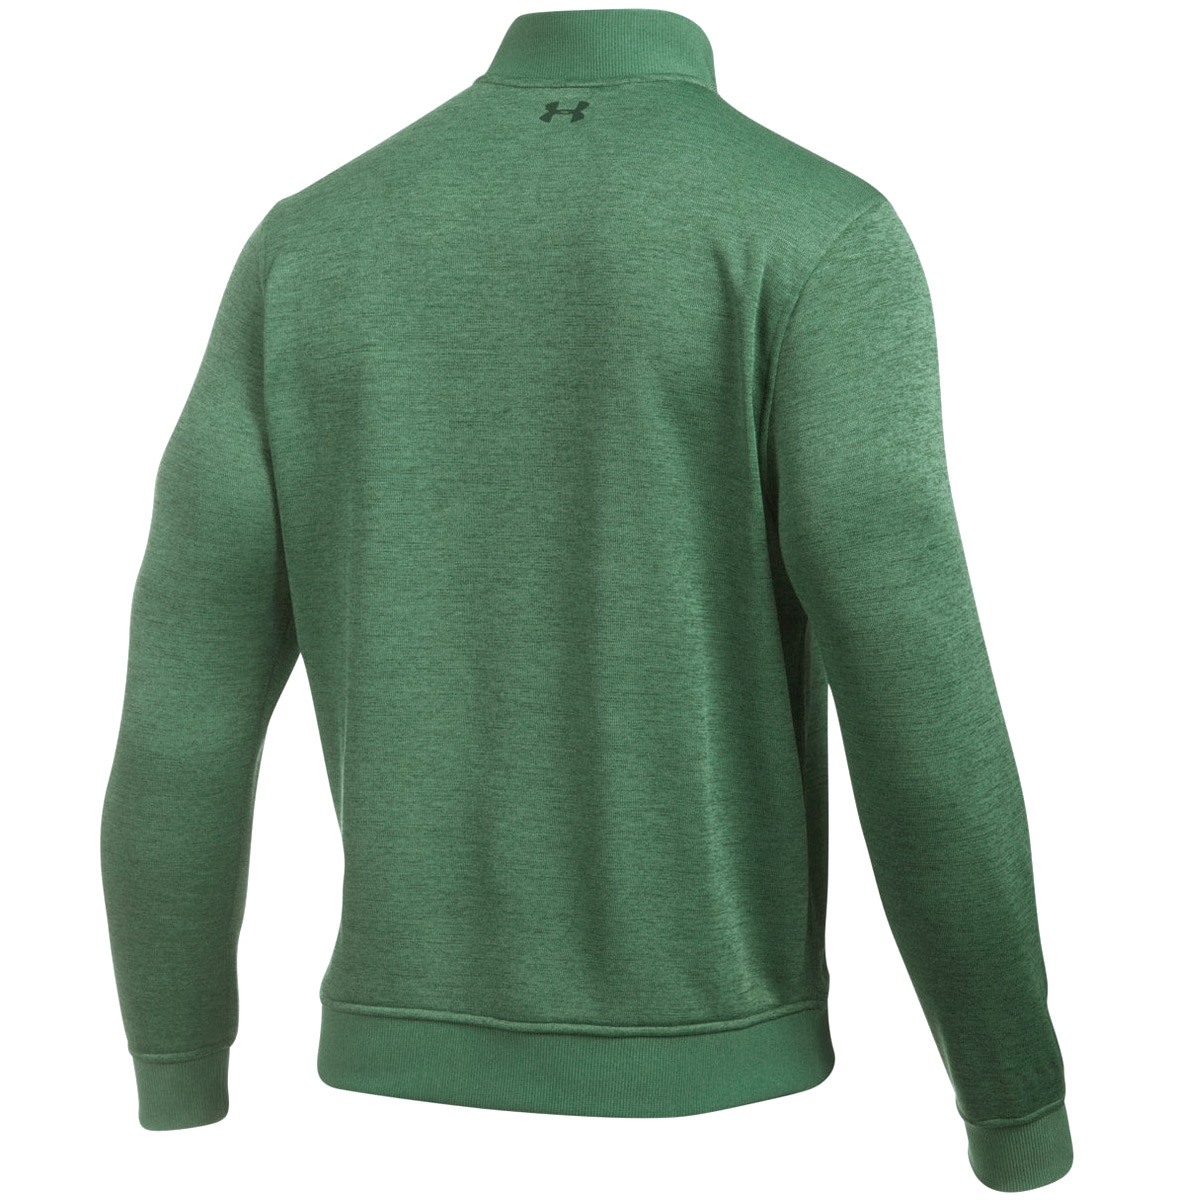 Under-Armour-Mens-UA-Storm-Sweater-Fleece-1-4-Zip-Pullover-Jumper-25-OFF-RRP thumbnail 5